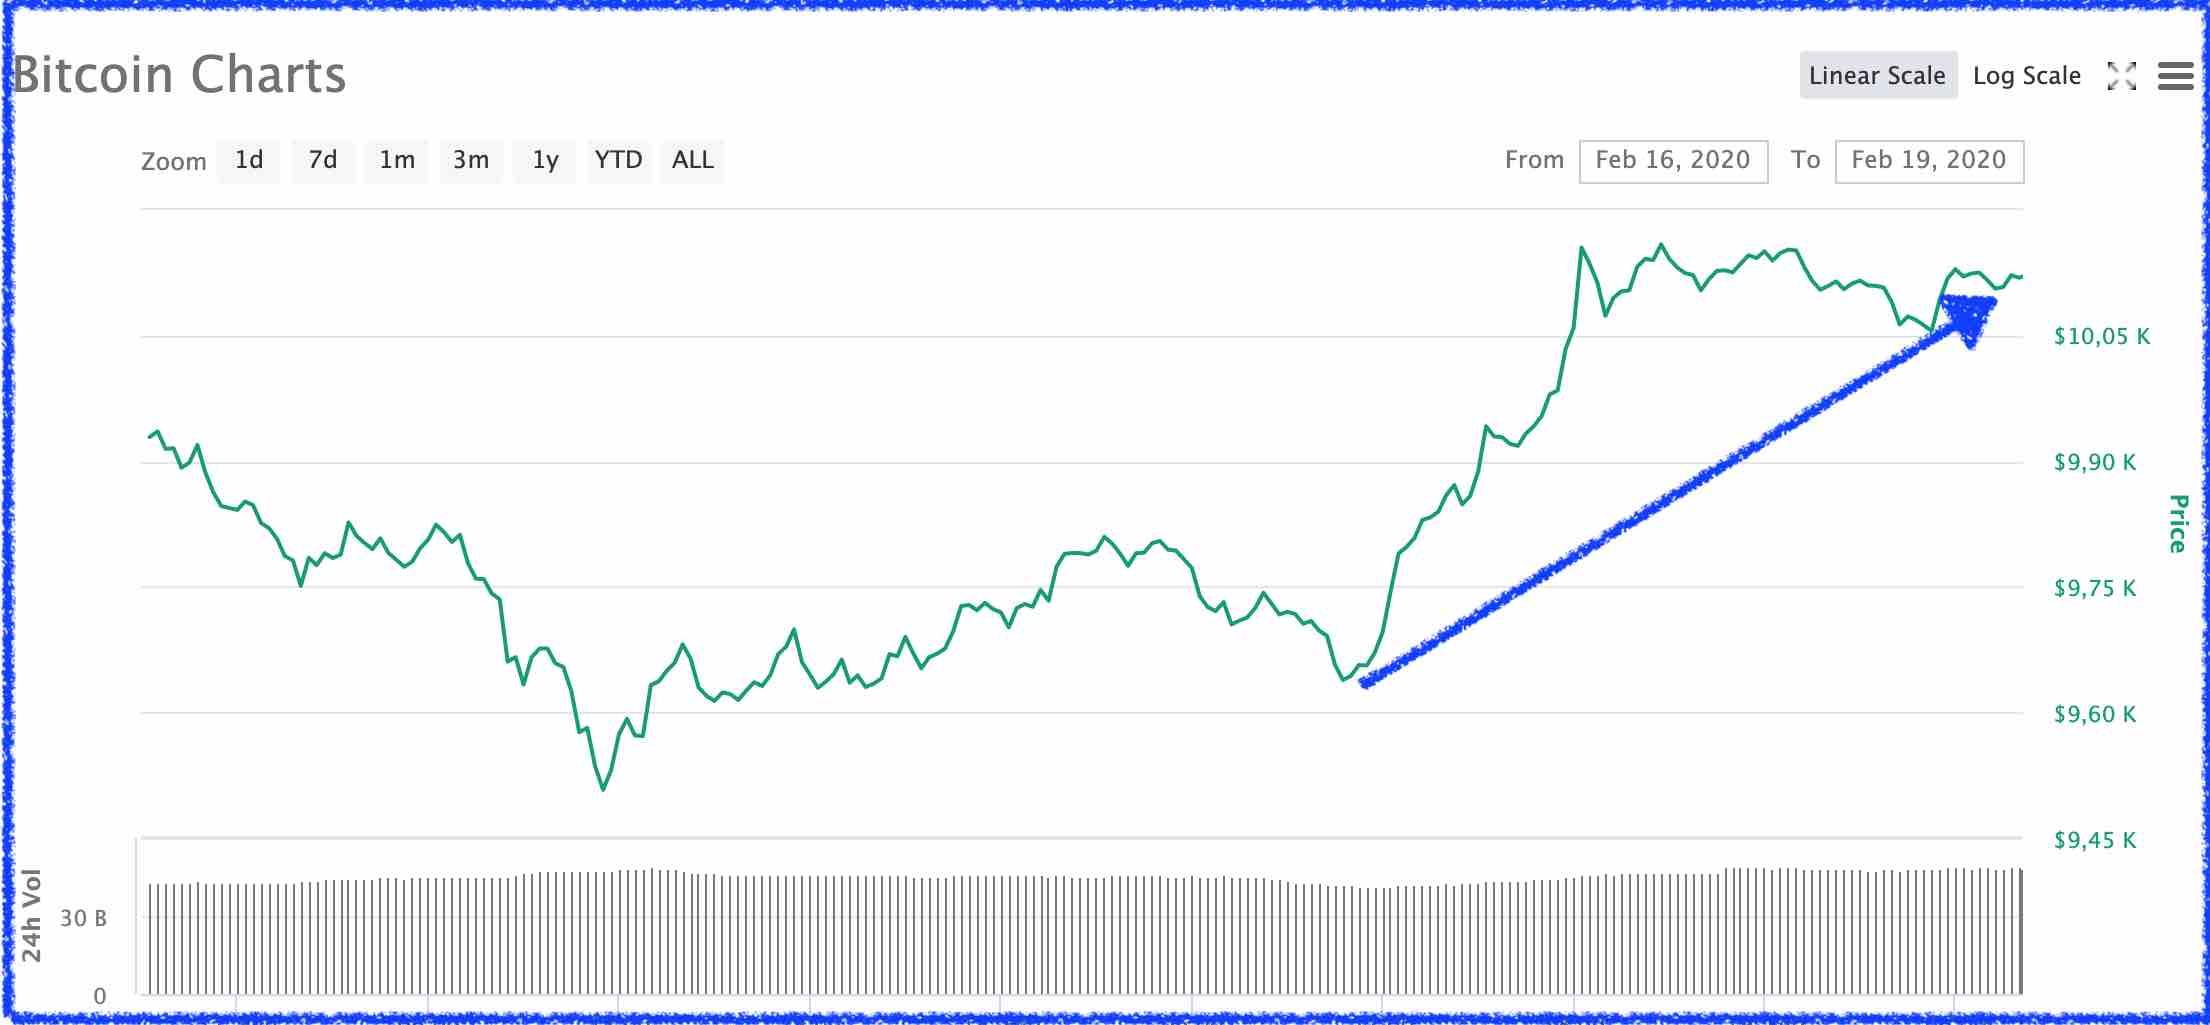 Bitcoin el 19 de febrero